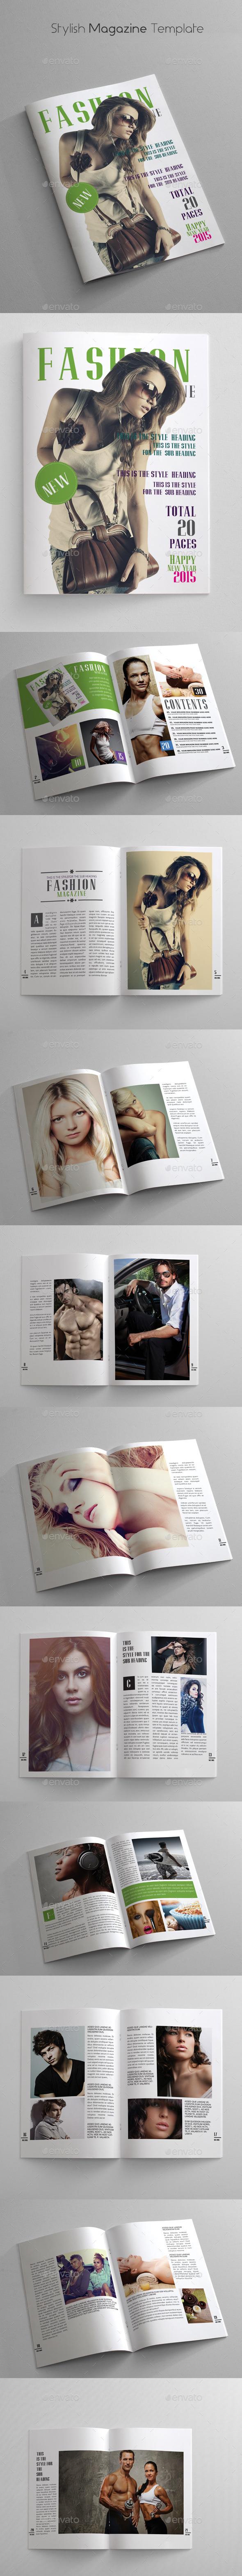 Stylish Magazine Template - Magazines Print Templates